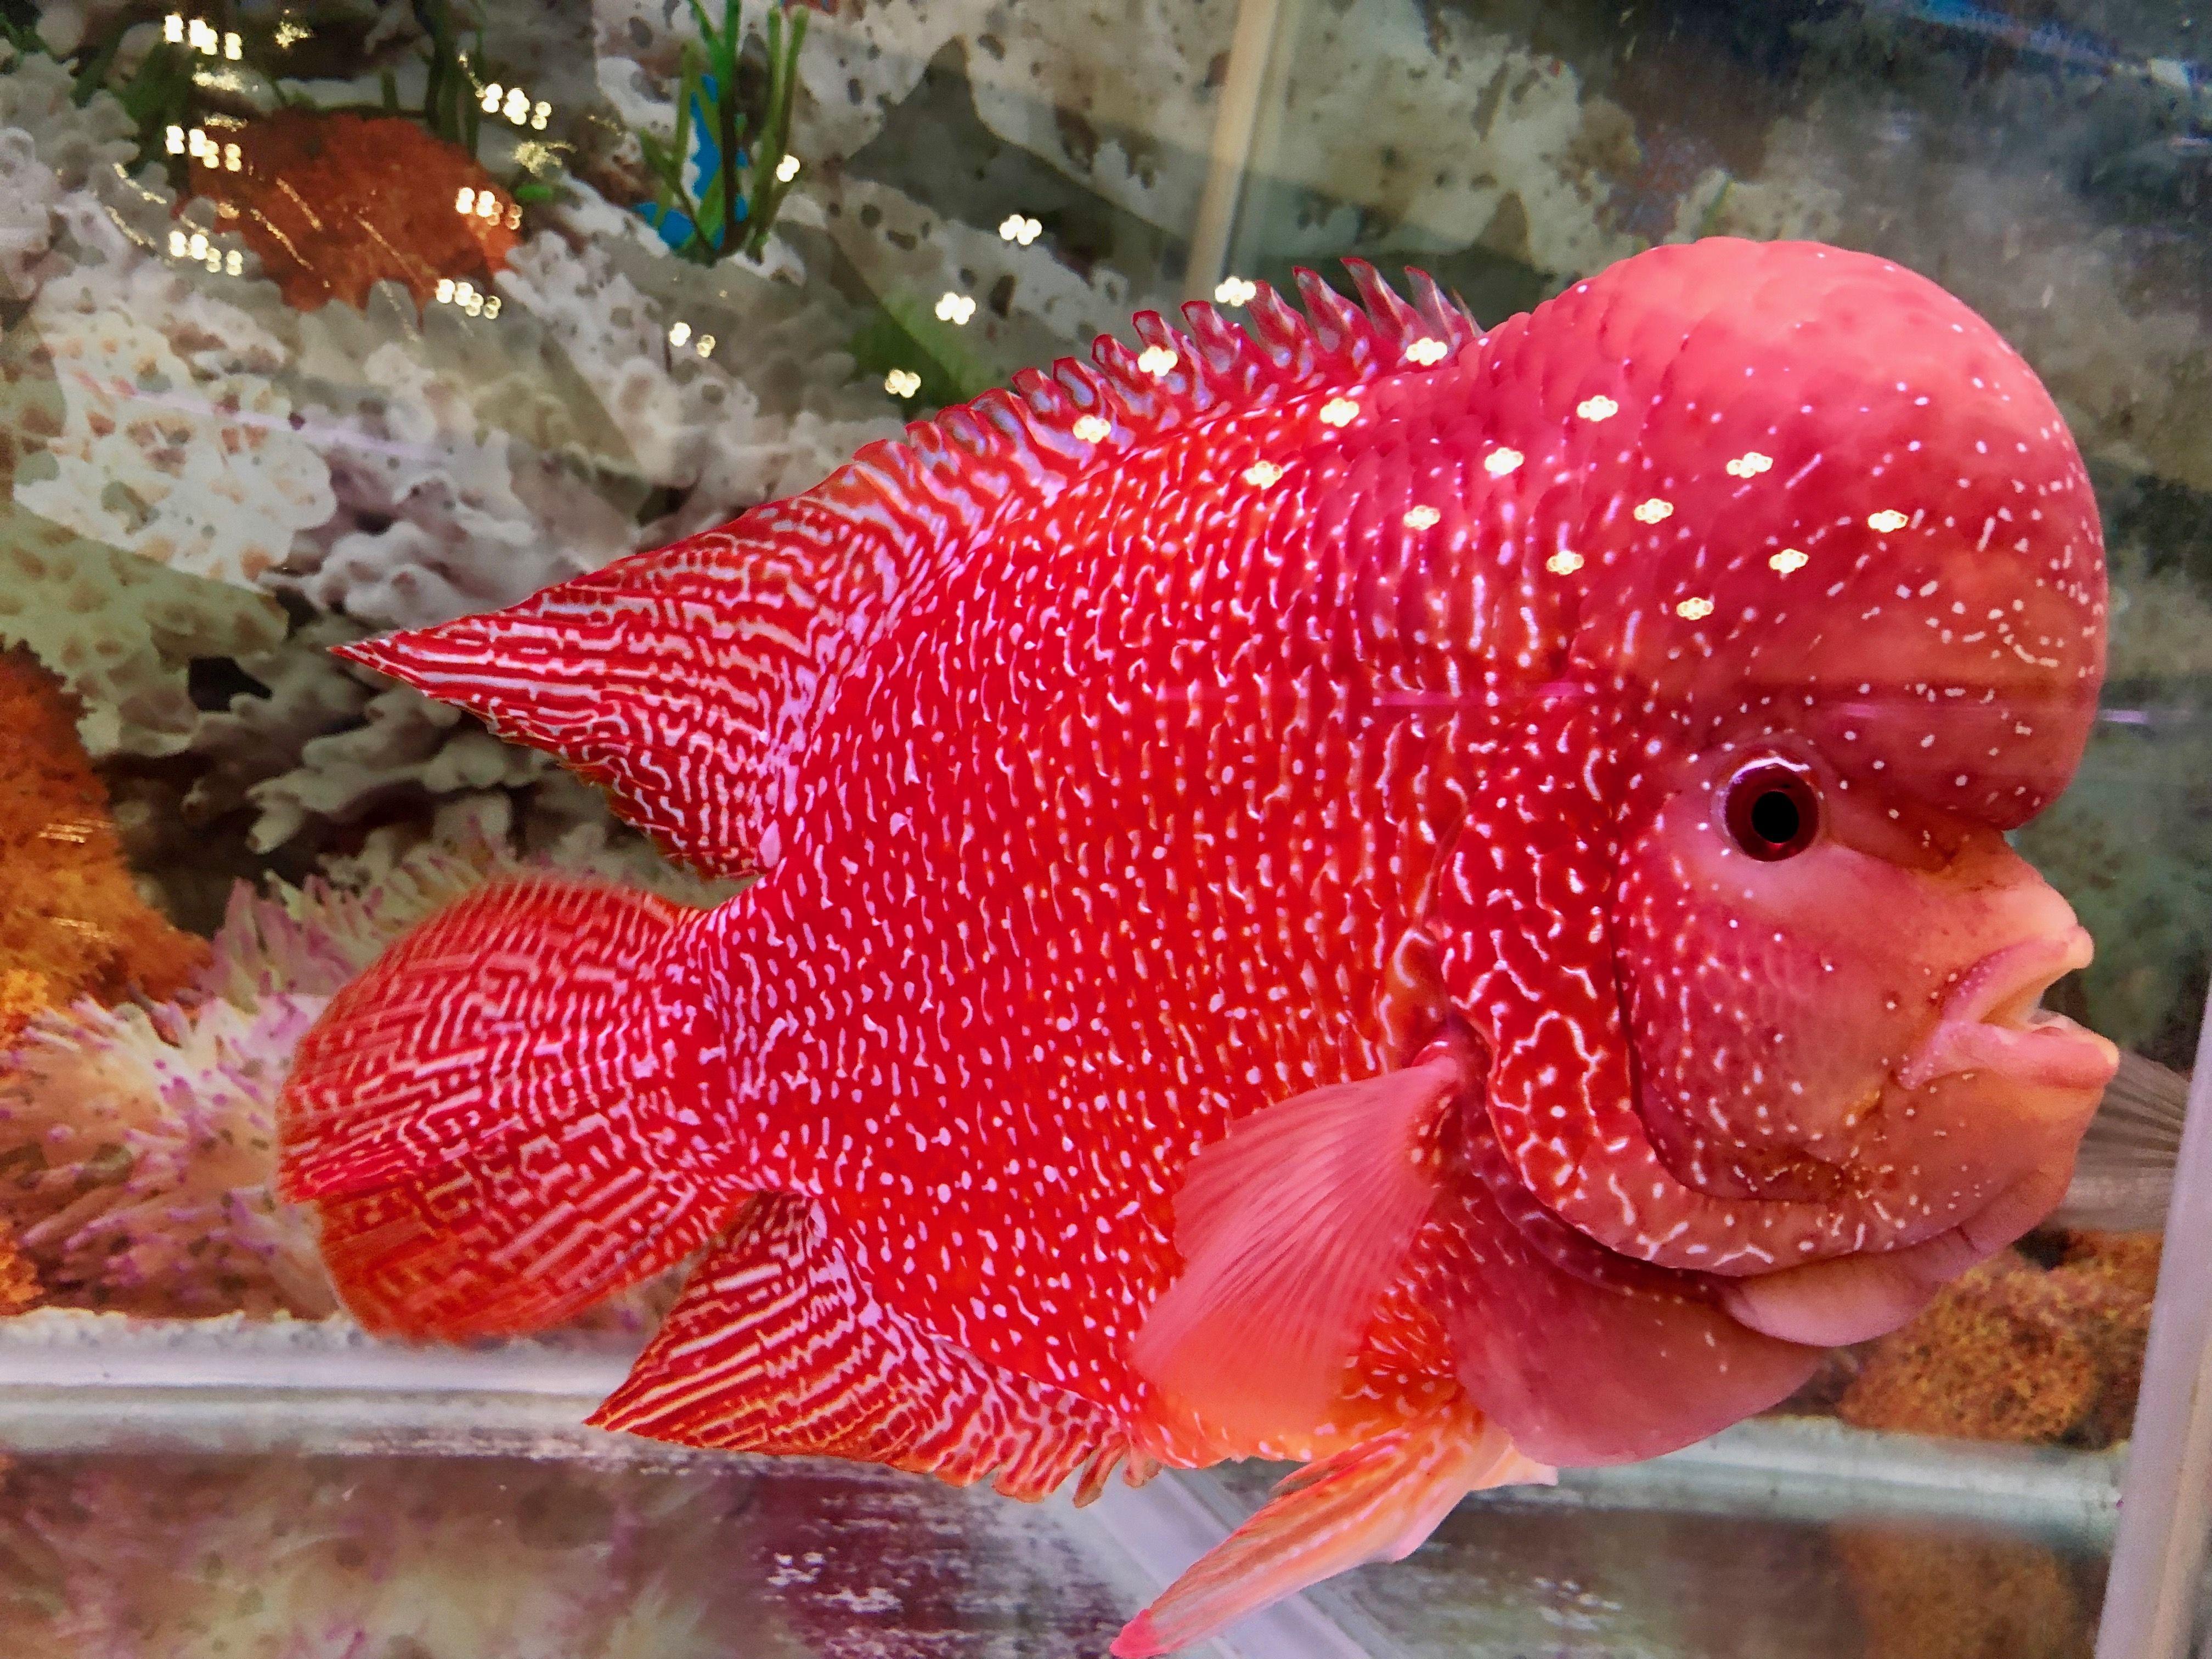 Pin By Mushun On 55 Gal Aquarium Fish Tropical Fish Aquarium Fish